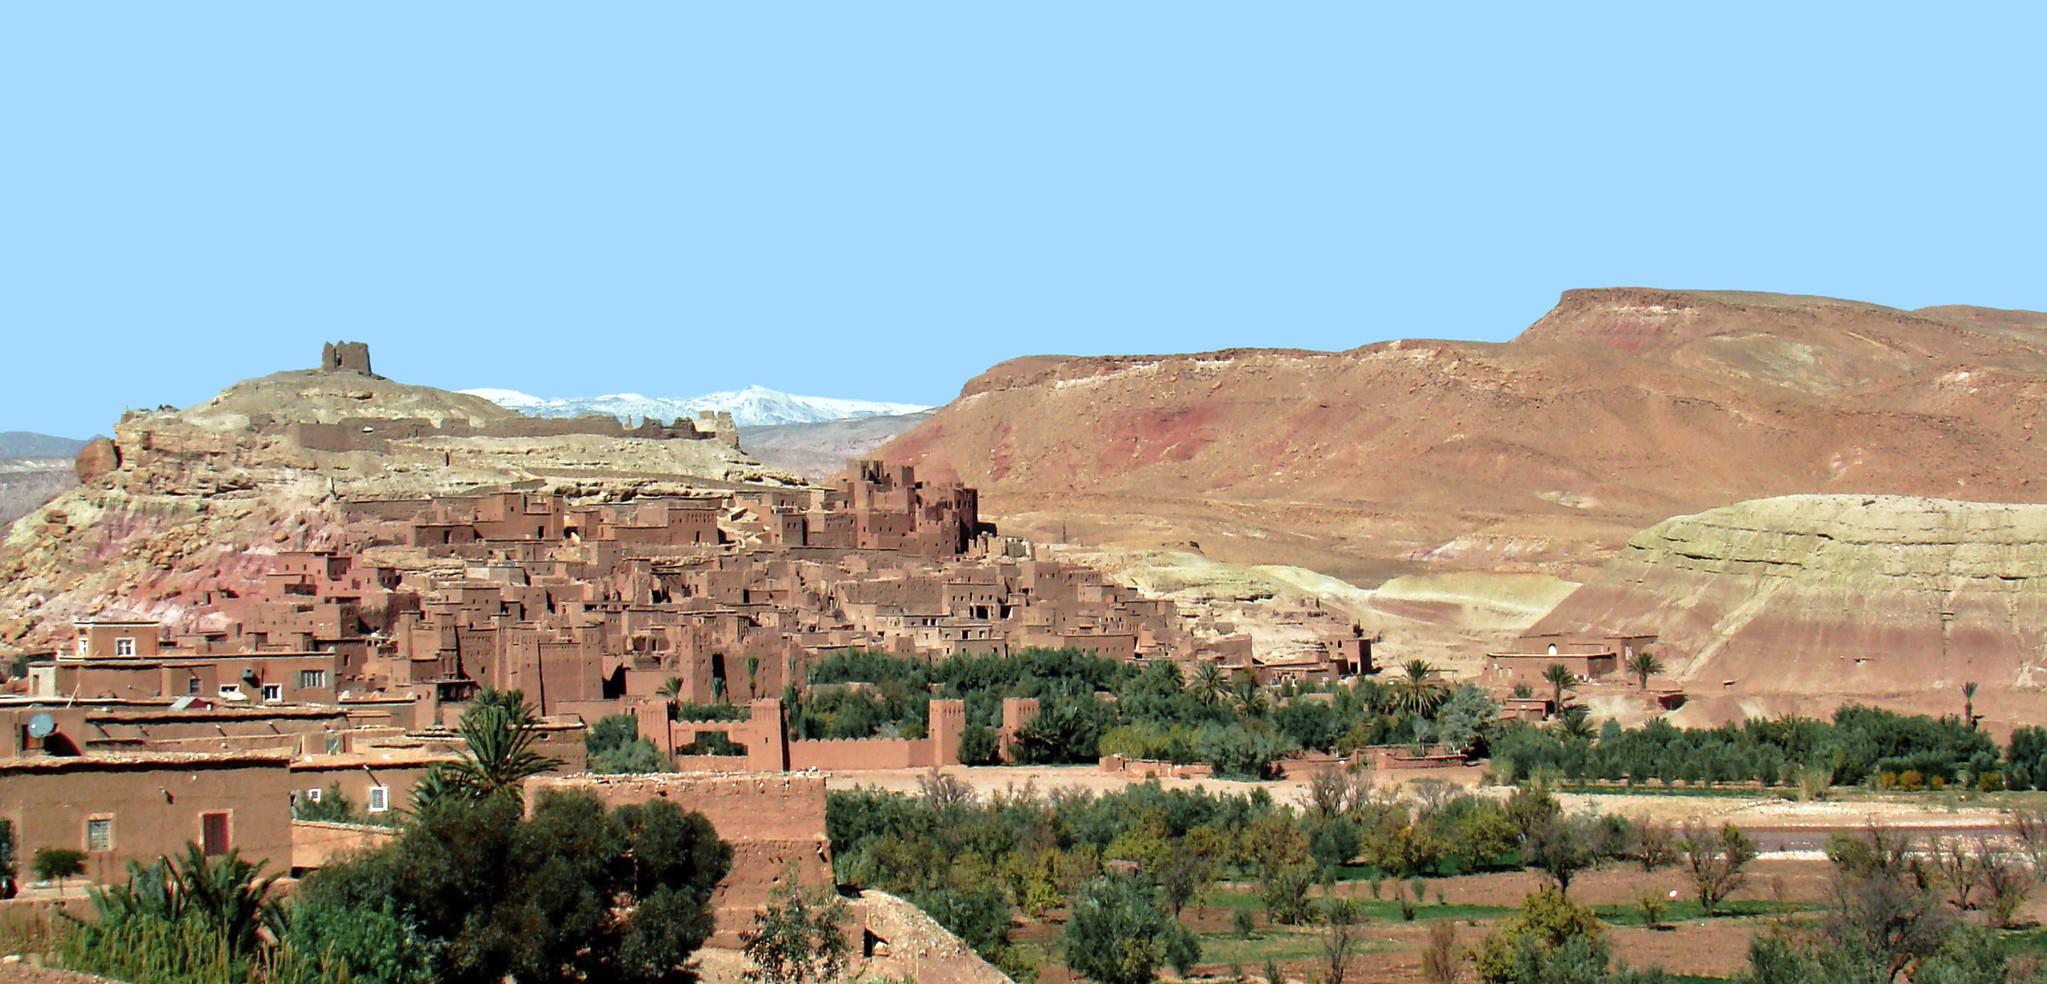 vista de ciudad fortificada Kasbah Ait Ben Haddou Ouarzazate Marruecos